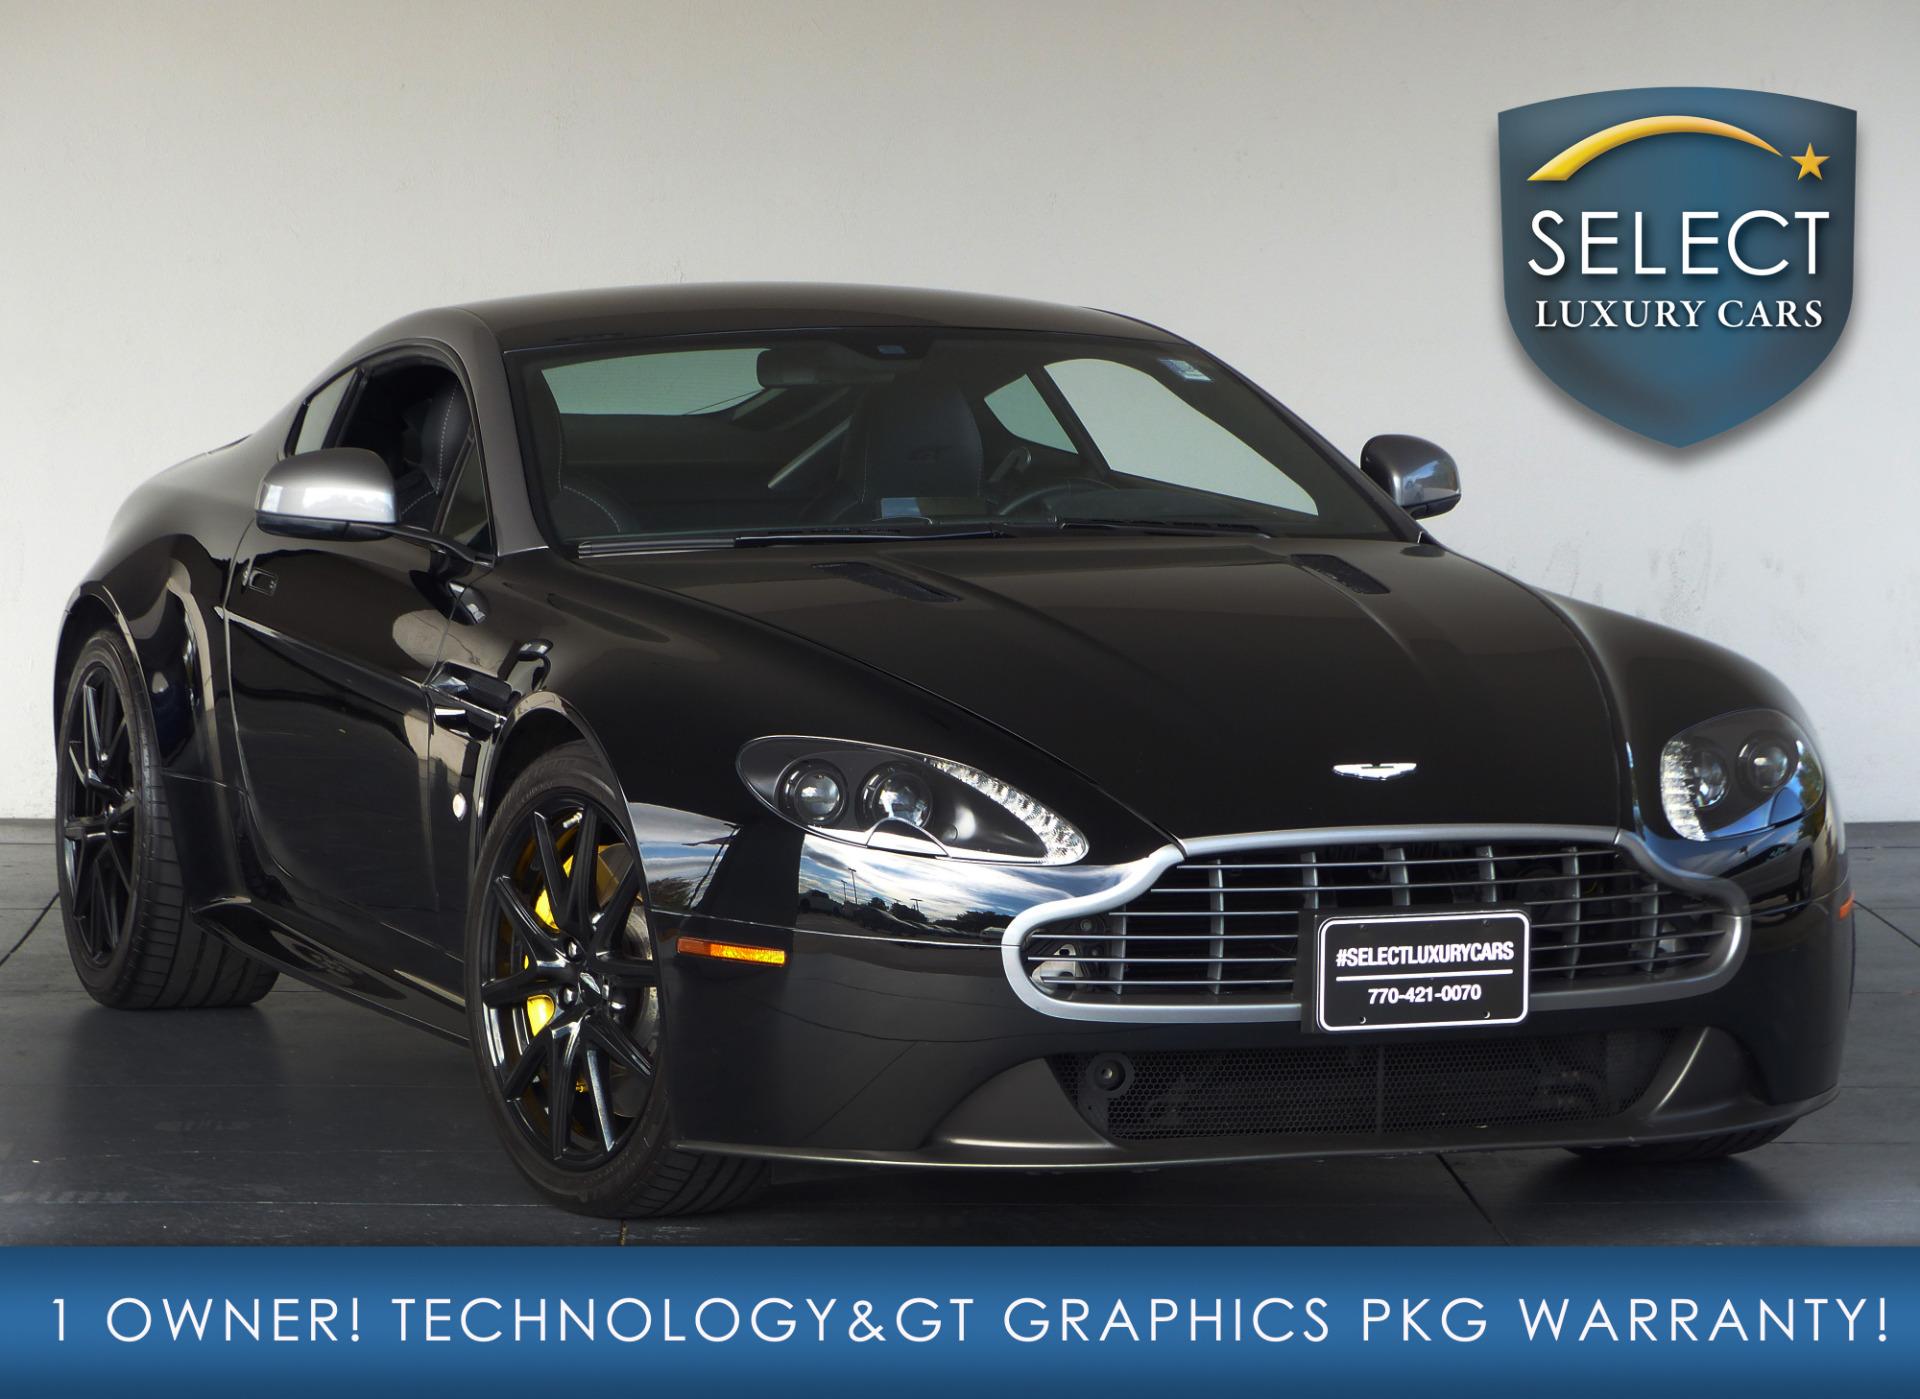 Select Luxury Cars In Marietta Ga: Used 2015 Aston Martin Vantage GT